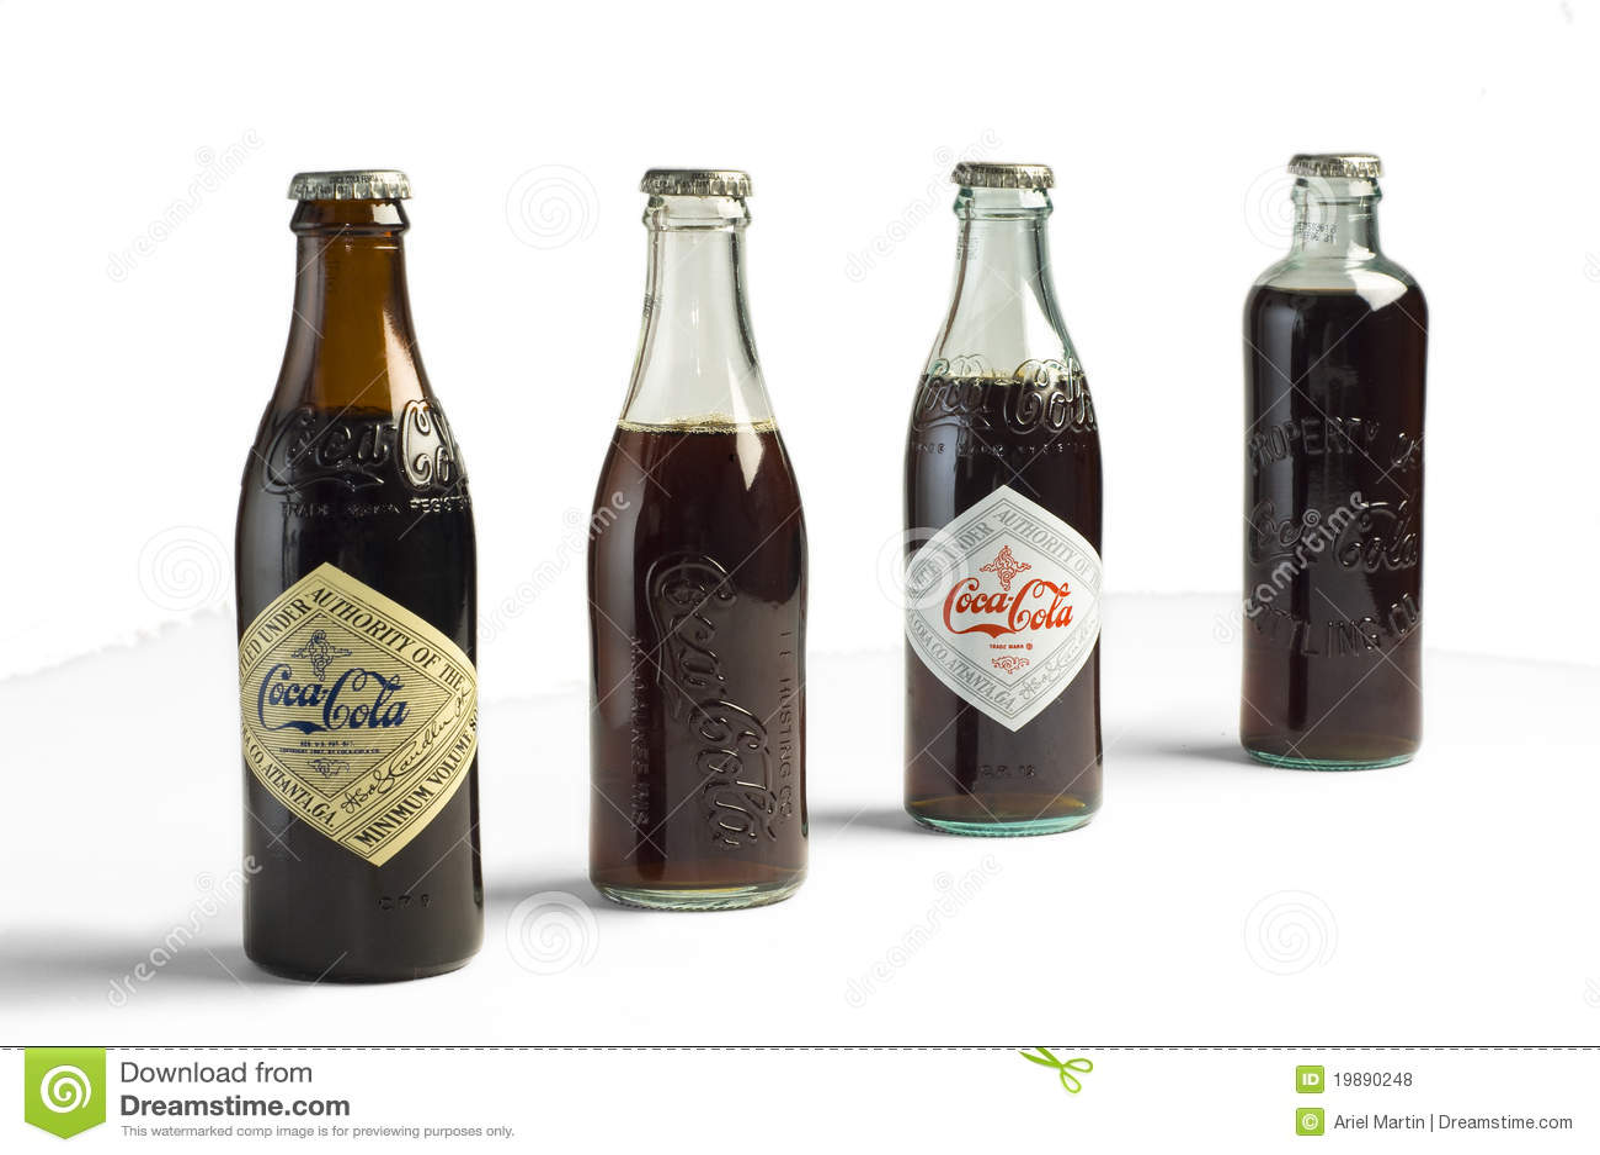 Original Coca Cola Bottles Vintage Coca Cola bottles